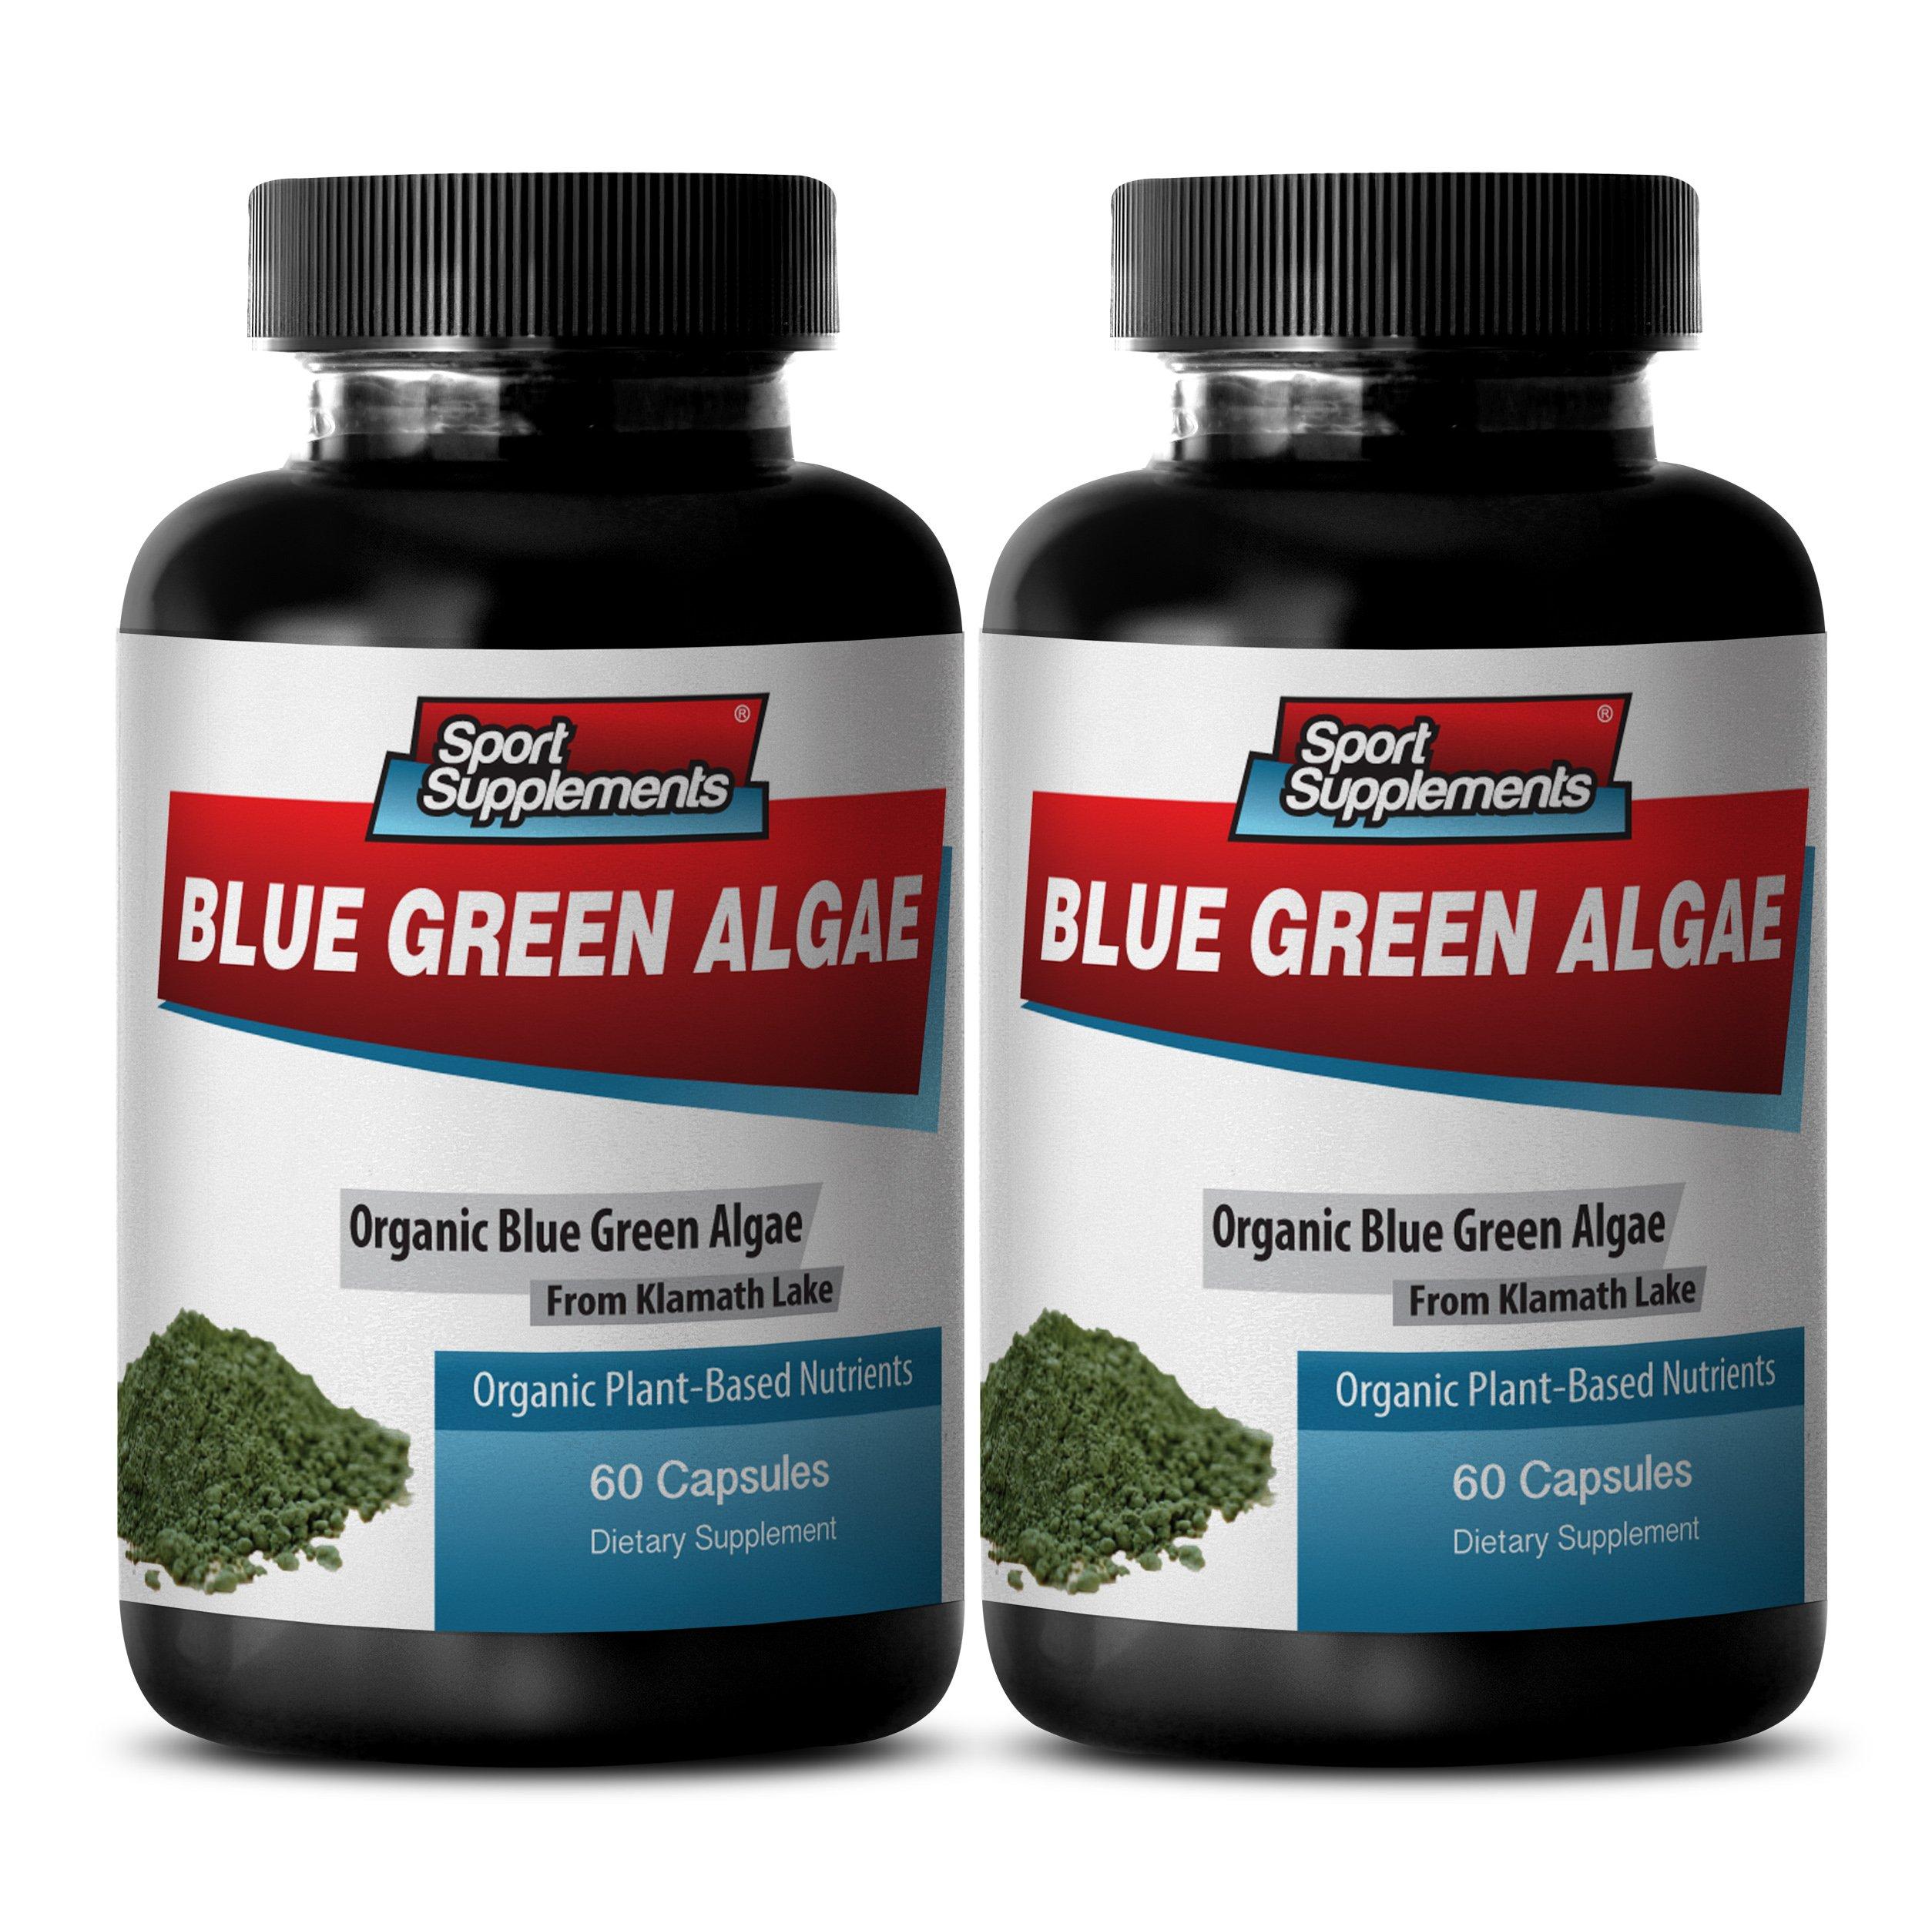 Dietary Supplement to Improve Fatigue - Klamath Blue Green Algae 500mg (2 Bottles 120 Capsules)